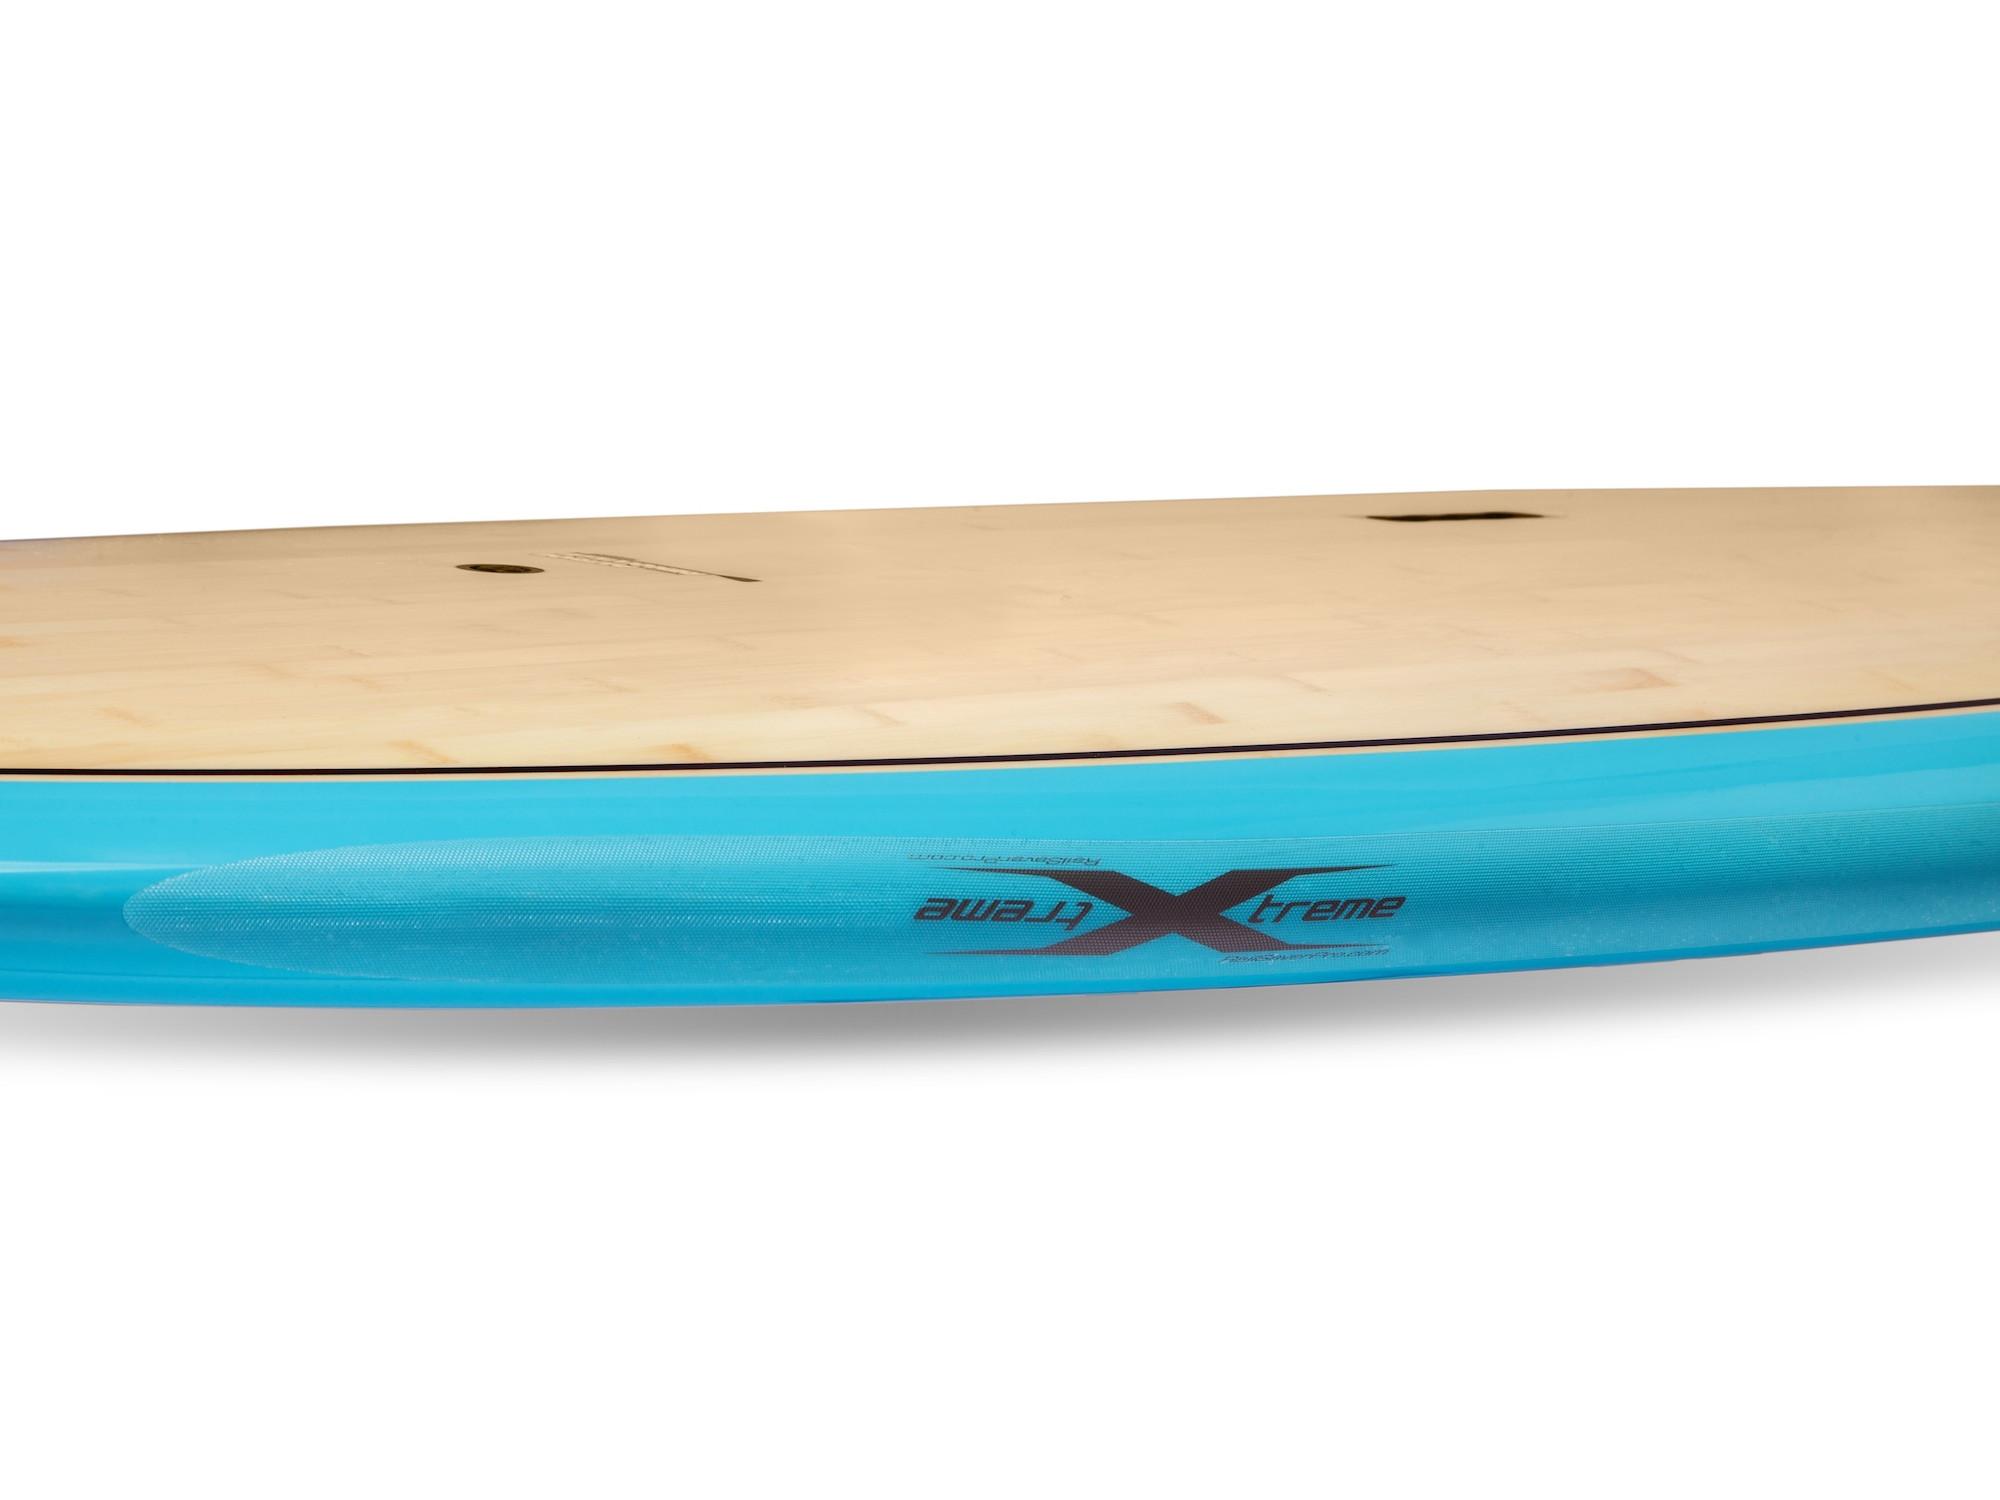 Xtreme transparent rail saver for short boards